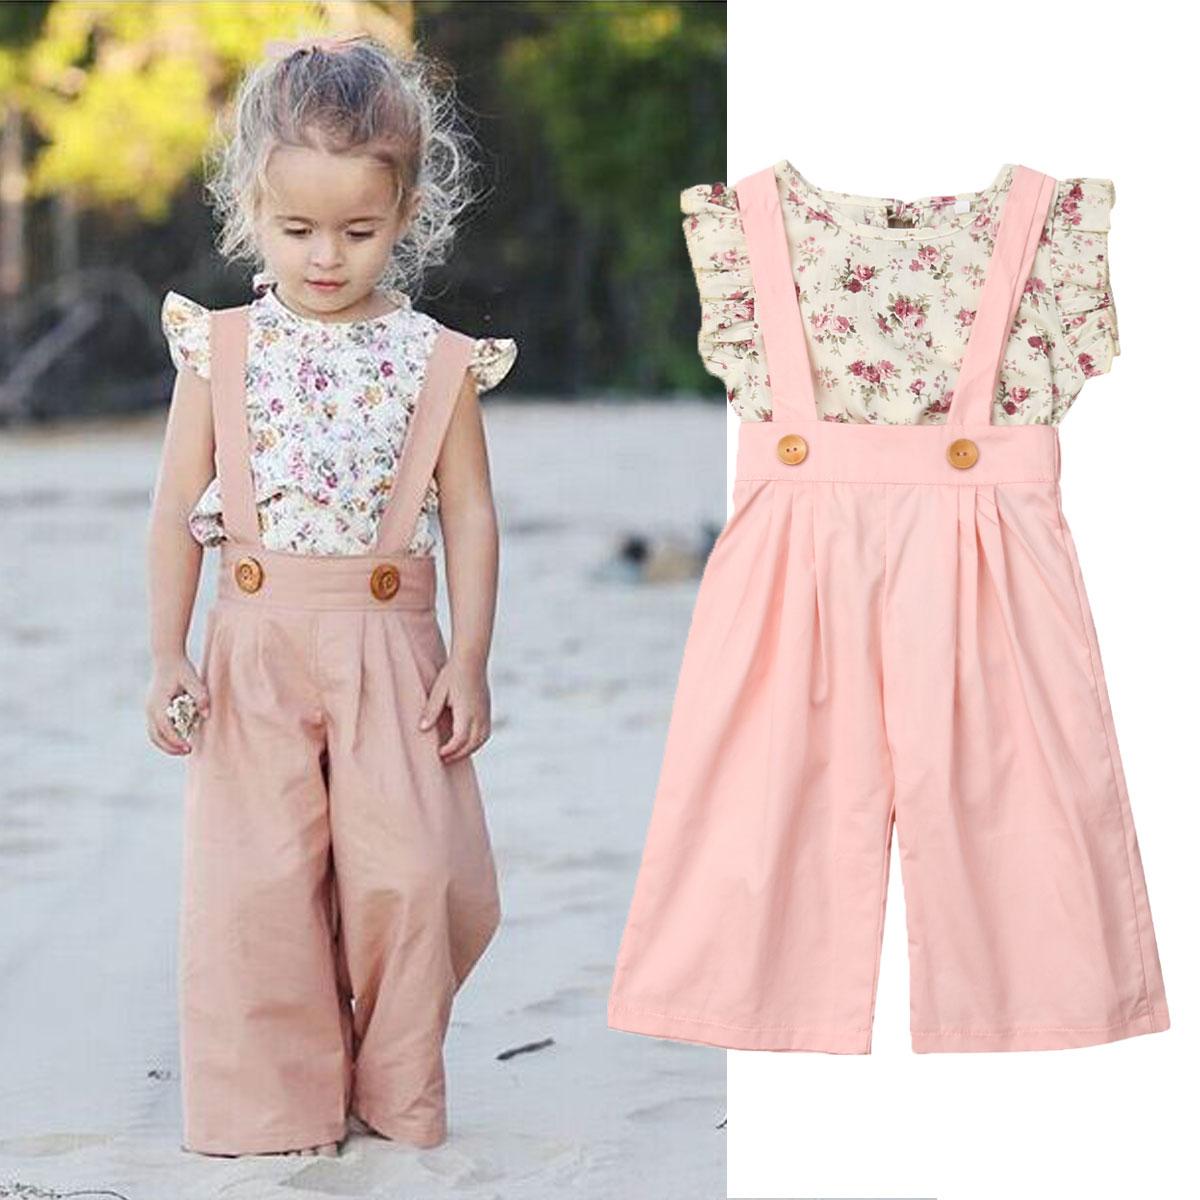 Hstore✿ Summer Girls Solid Print Ruffles Bow Swimwear Kids Baby Swimsuit Bikini Outfits